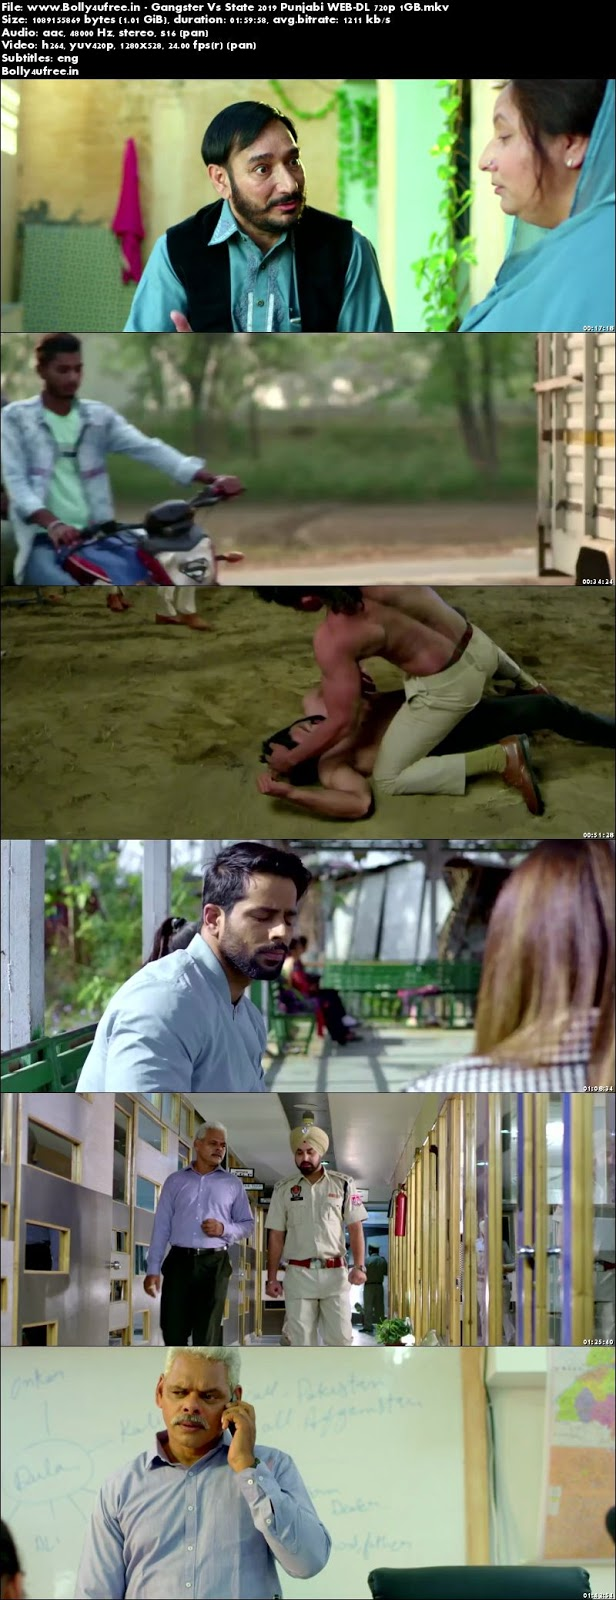 Gangster Vs State 2019 Punjabi WEB-DL 720p 1GB Bolly4ufree.in